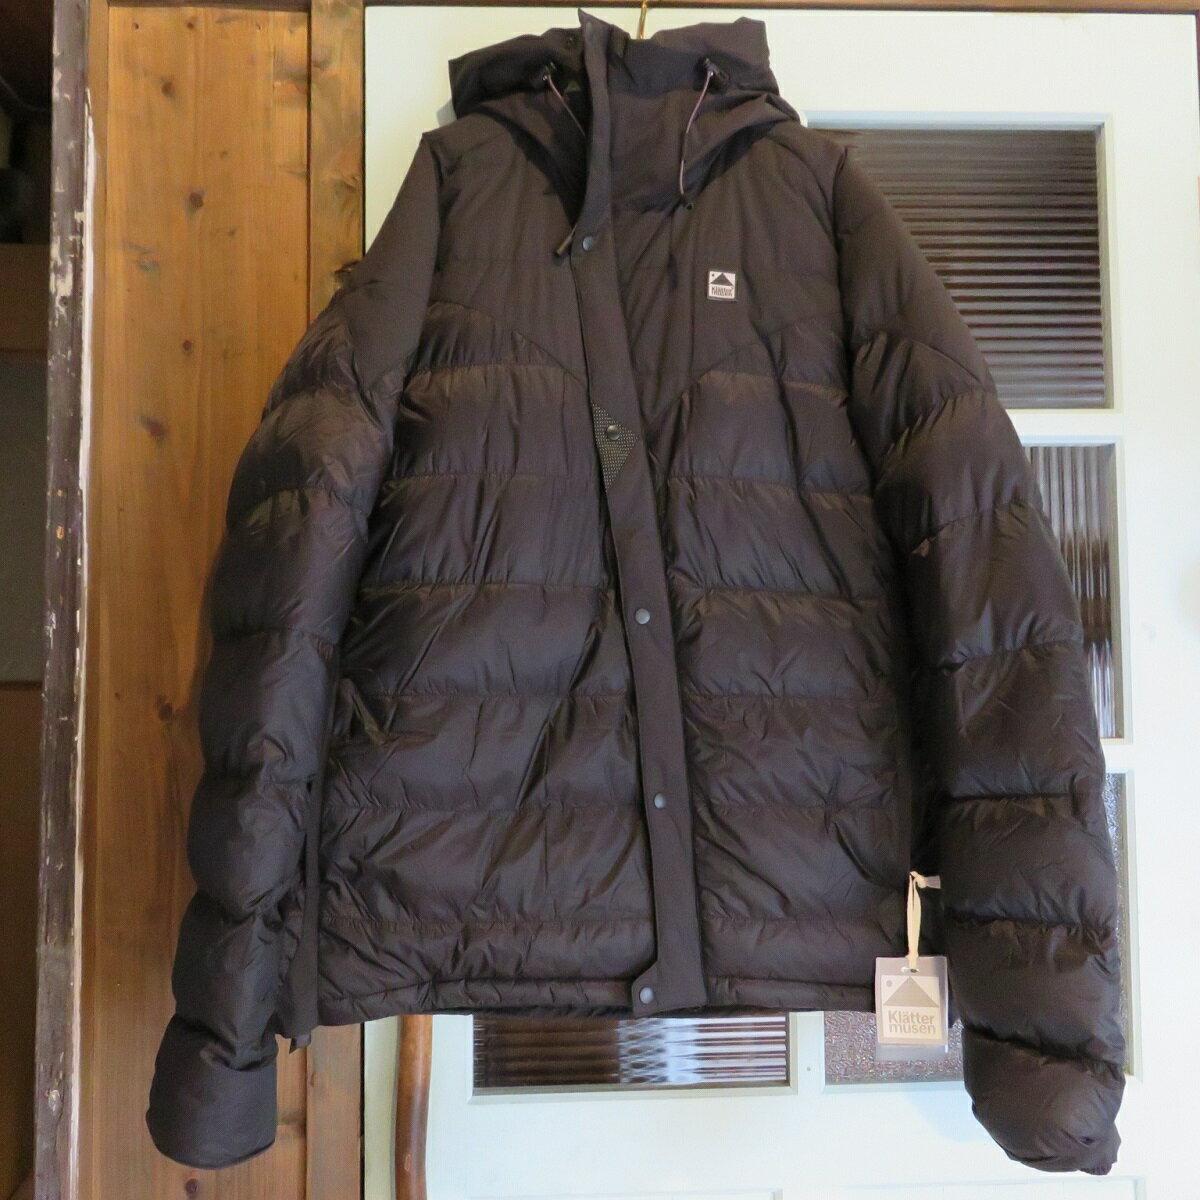 KLATTERMUSEN(クレッタルムーセン) Atle2.0 Jacket M's Raven Lサイズ